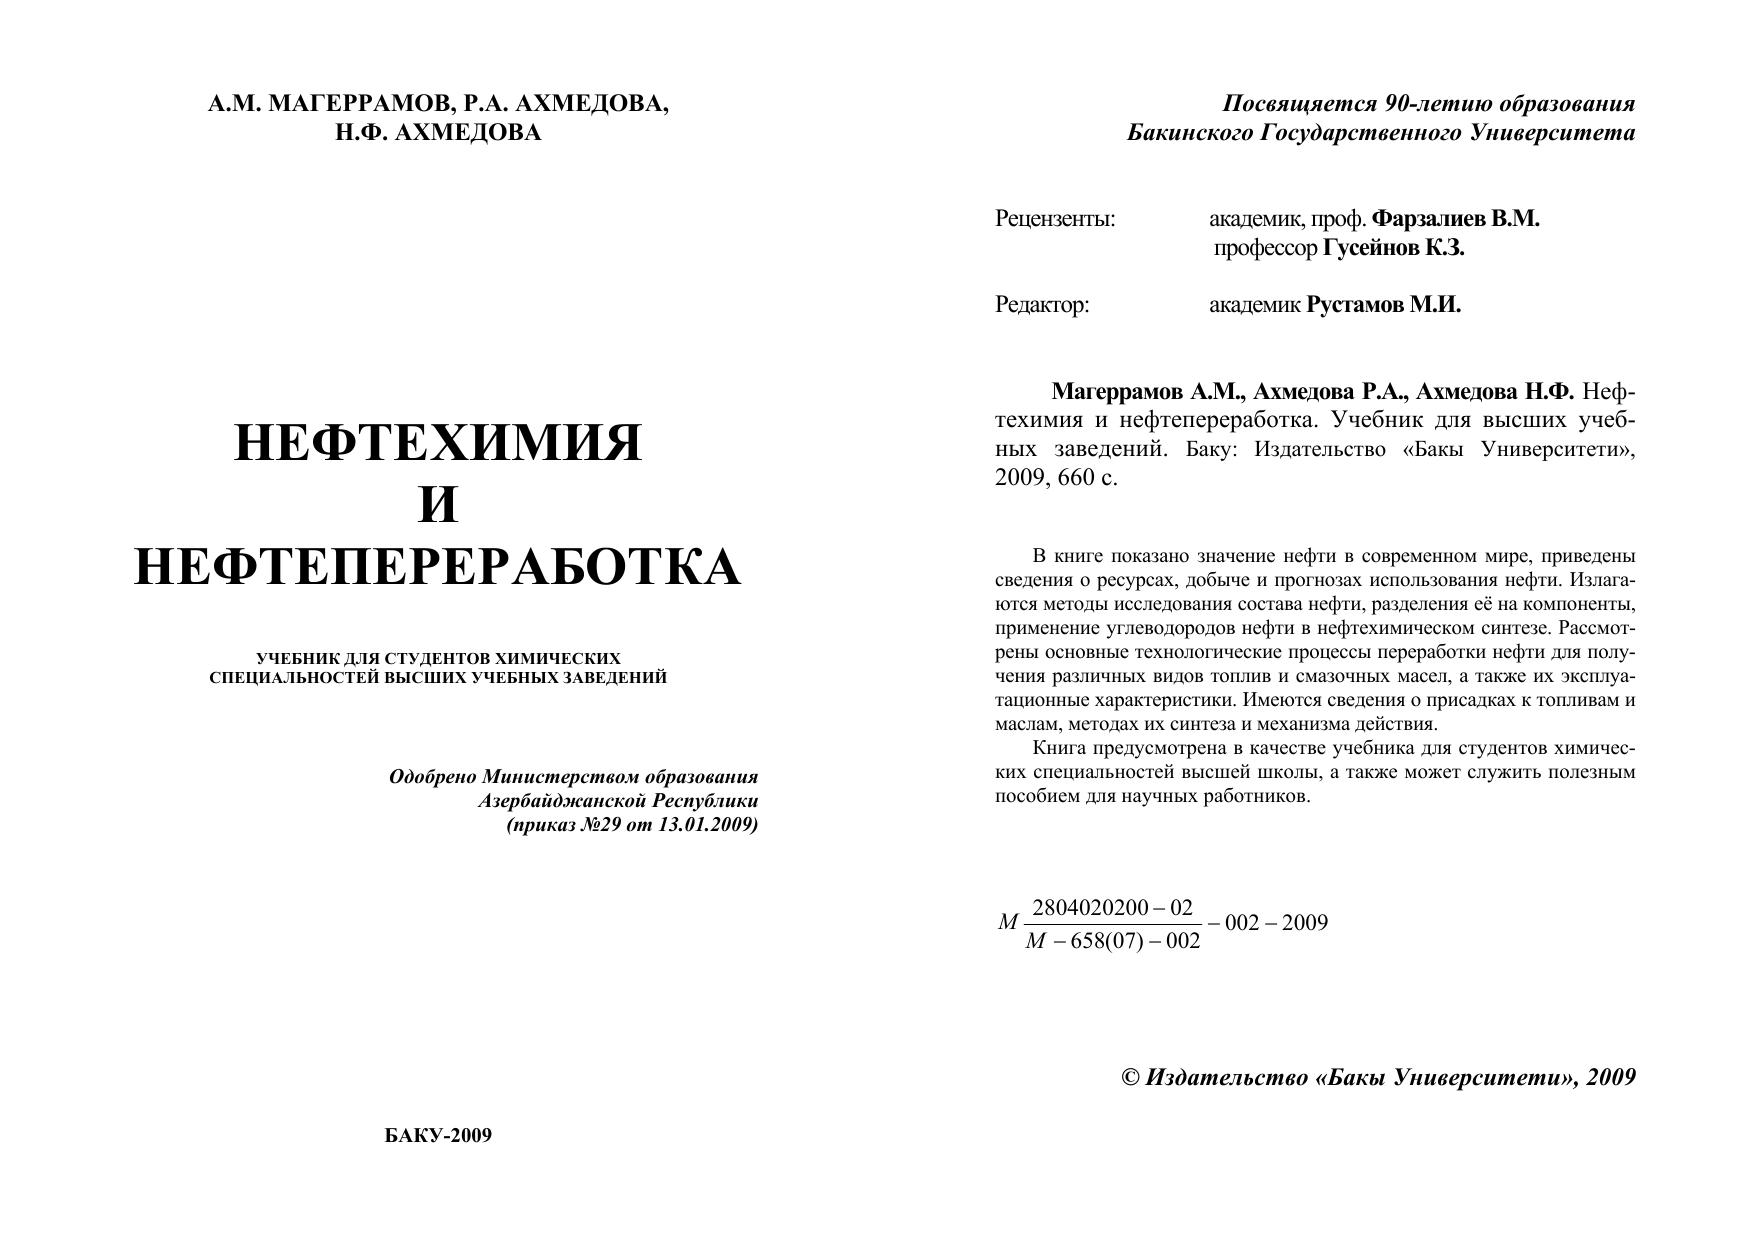 Хлороформ влияние на организм. хлороформ и эфир